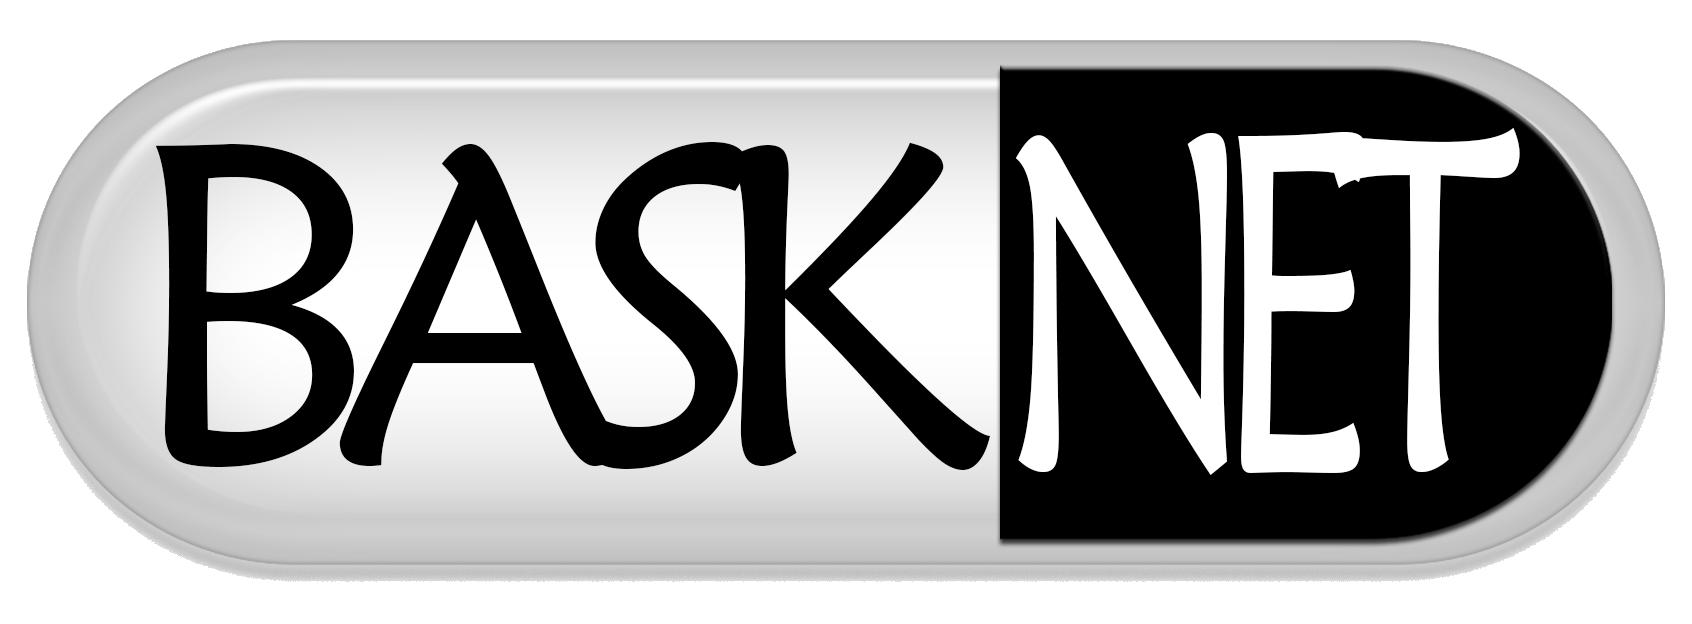 Basknet